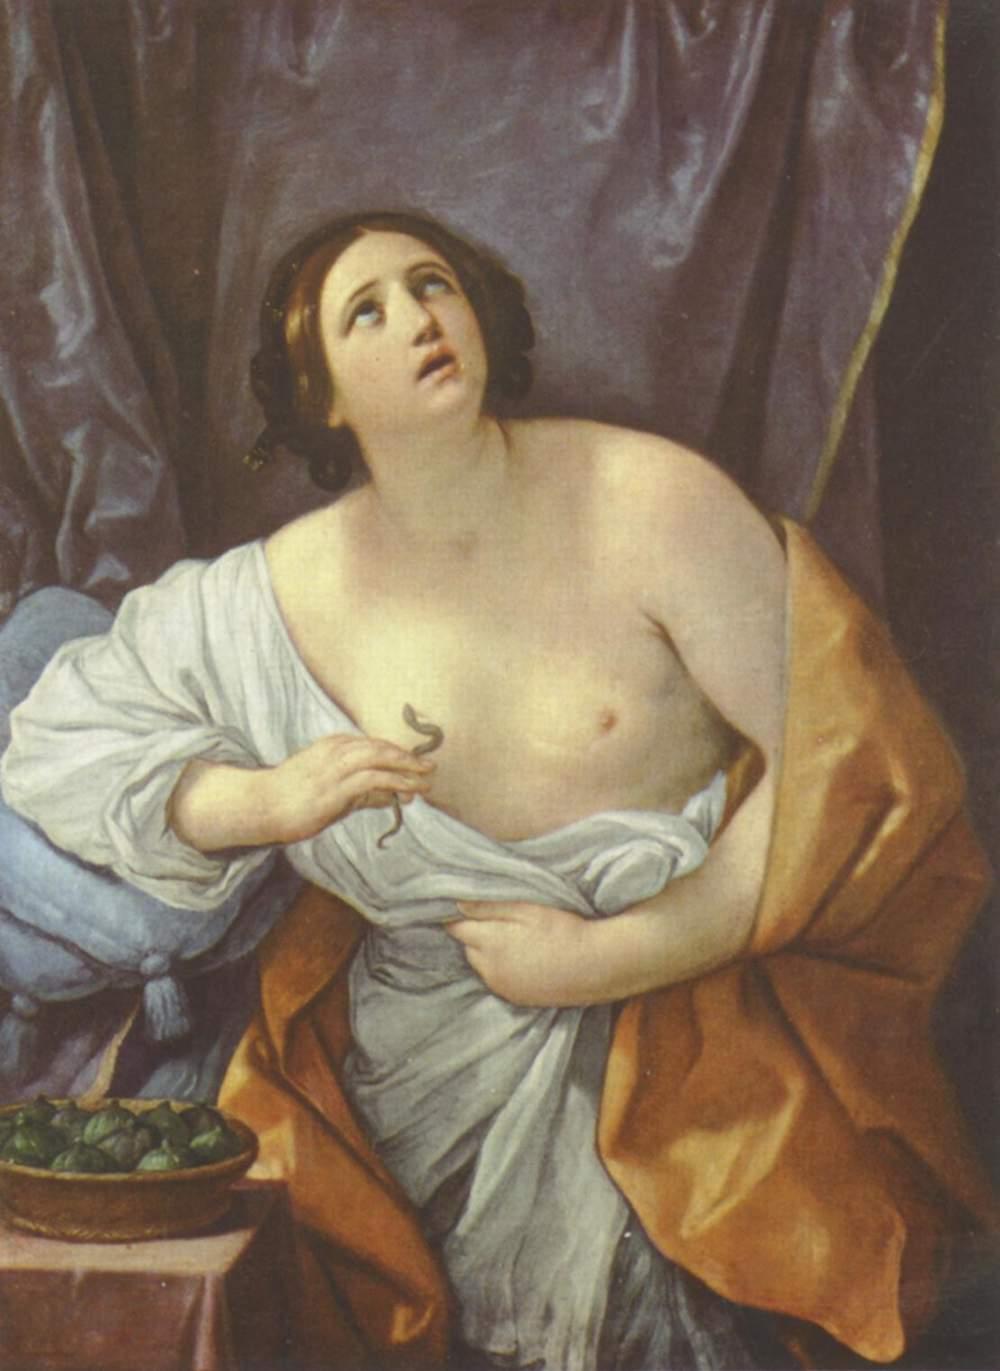 http://uploads8.wikiart.org/images/guido-reni/cleopatra.jpg